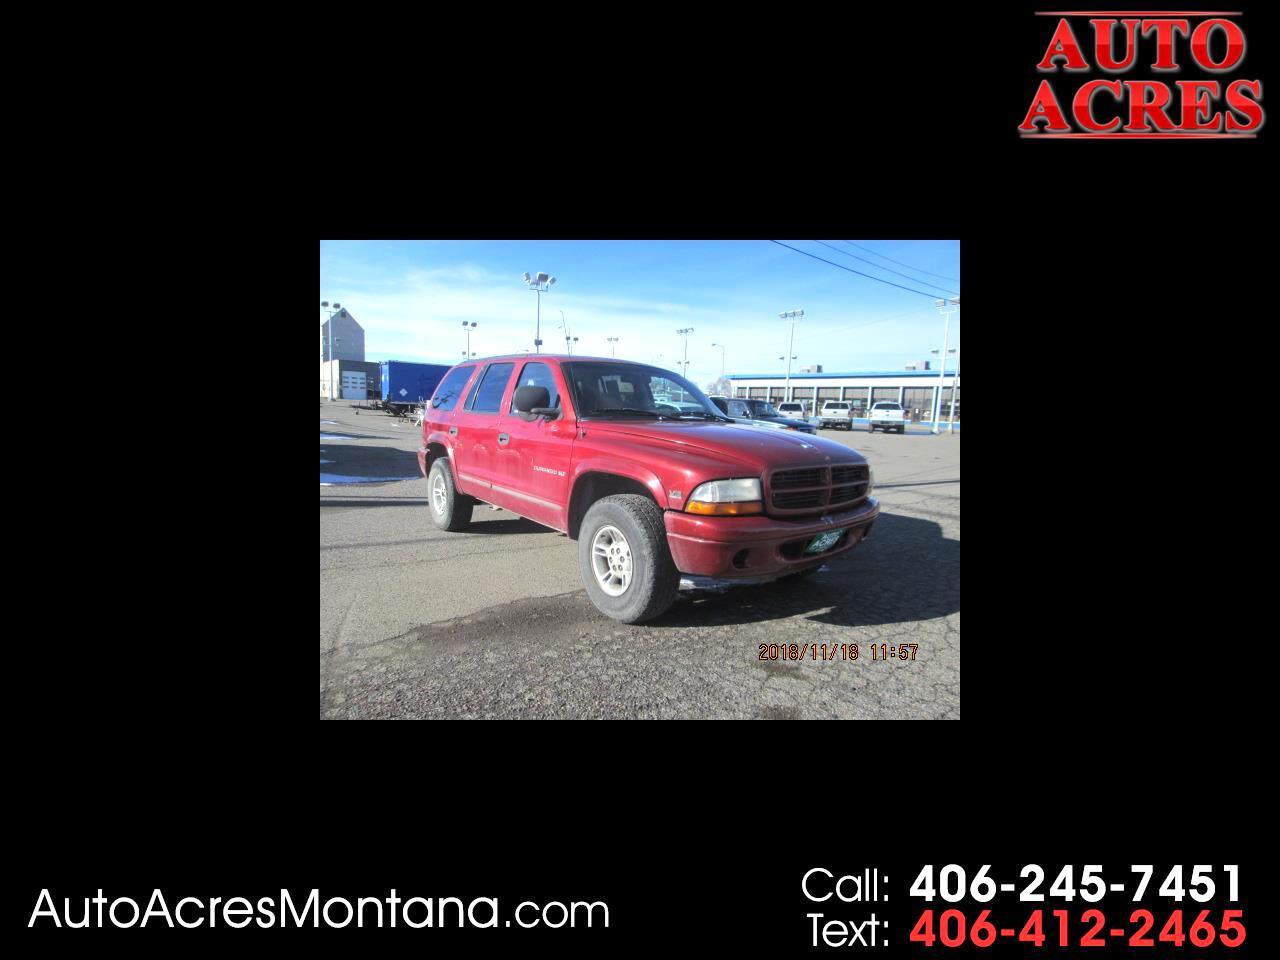 1999 Dodge Durango 4dr 4WD